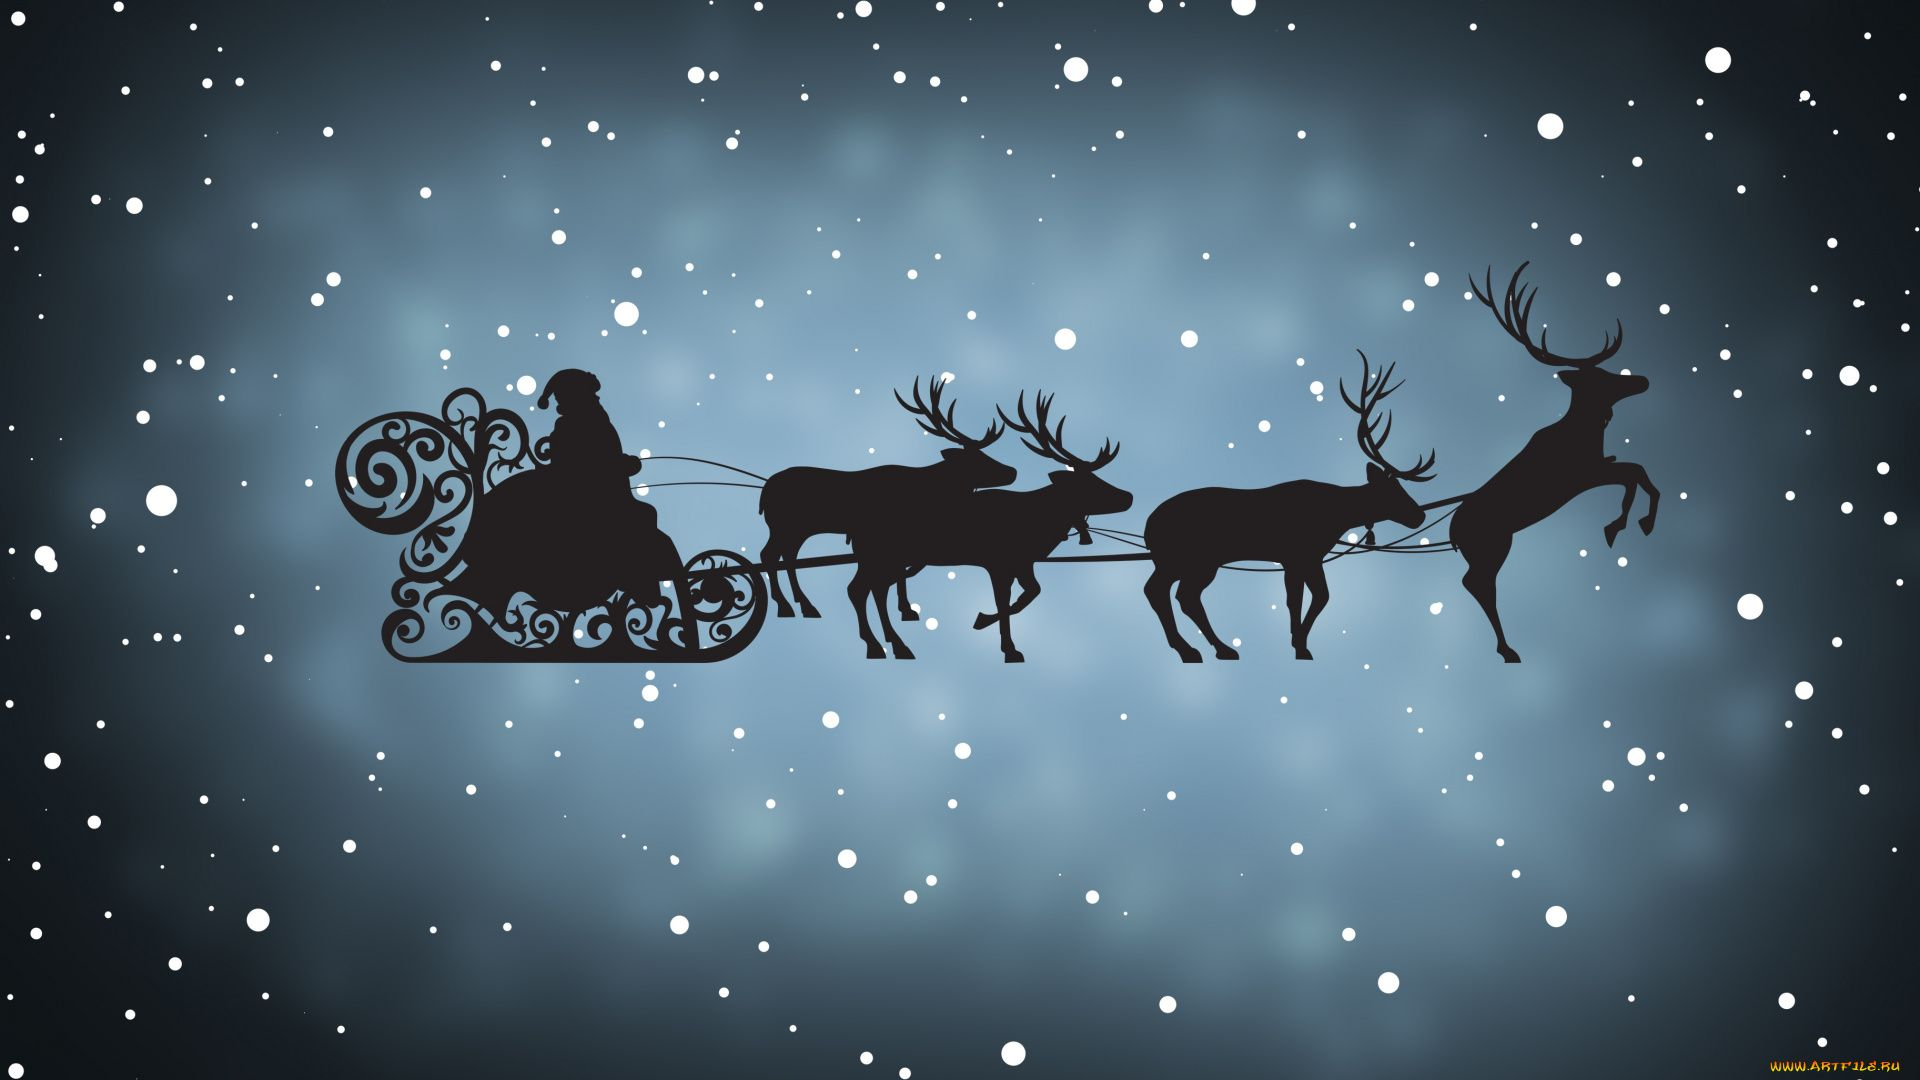 Christmas Sleigh Free Desktop Wallpaper